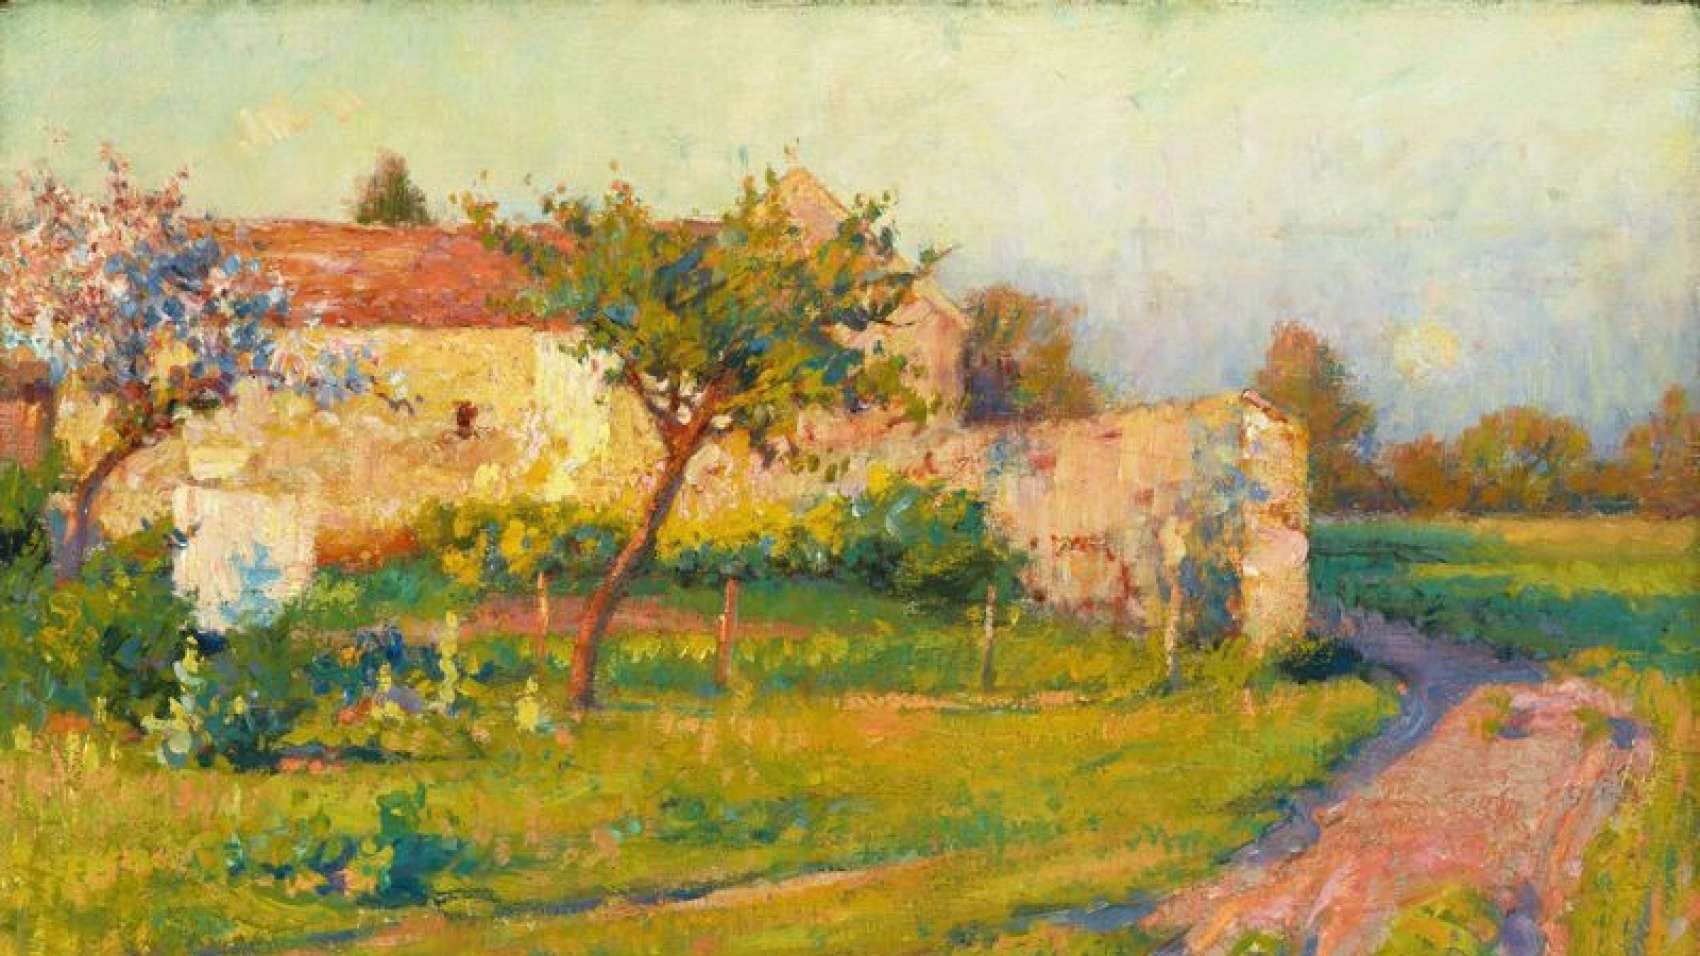 Роберт Воннох (1858-1933). Весна во Франции. Источник http://americanartgallery.org/